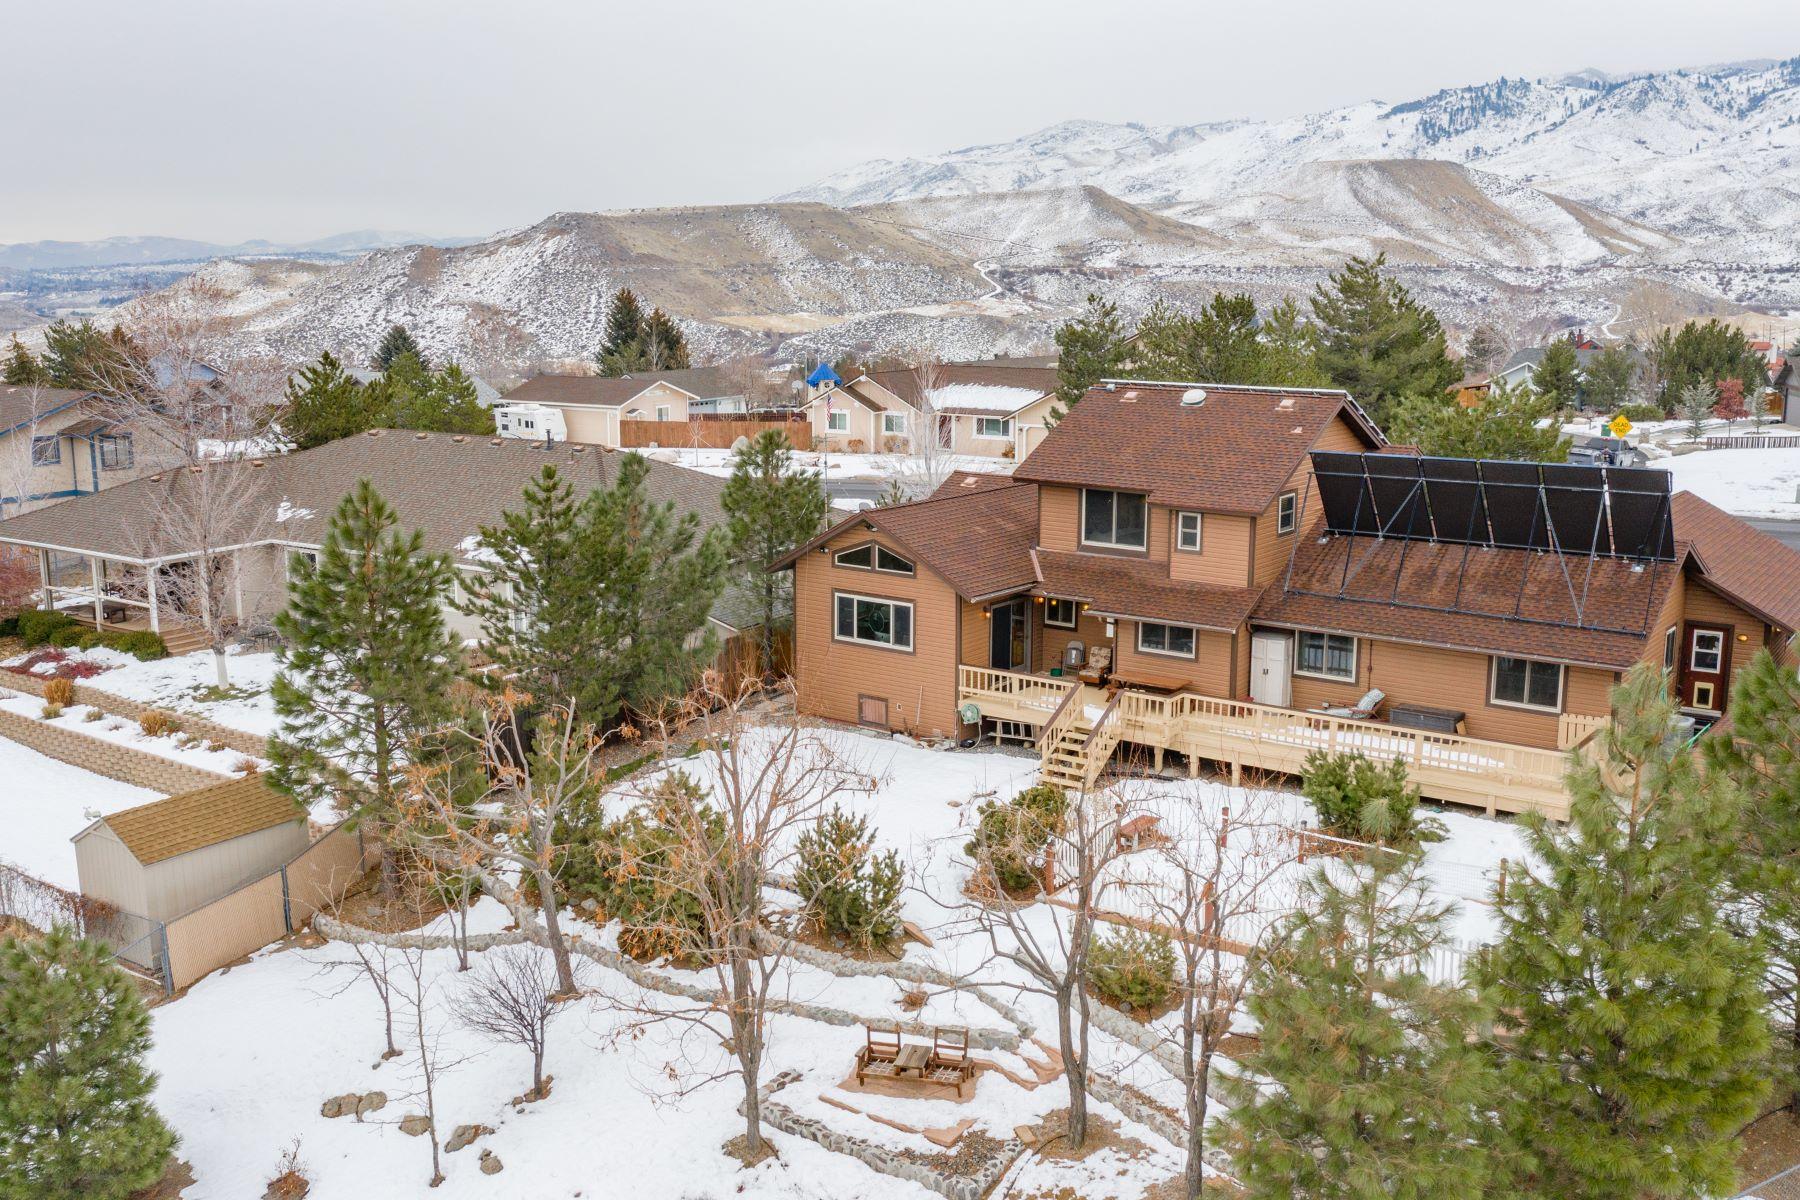 独户住宅 为 销售 在 295 Mogul Mountain Drive, Reno, Nevada 295 Mogul Mountain Drive 里诺, 内华达州 89523 美国